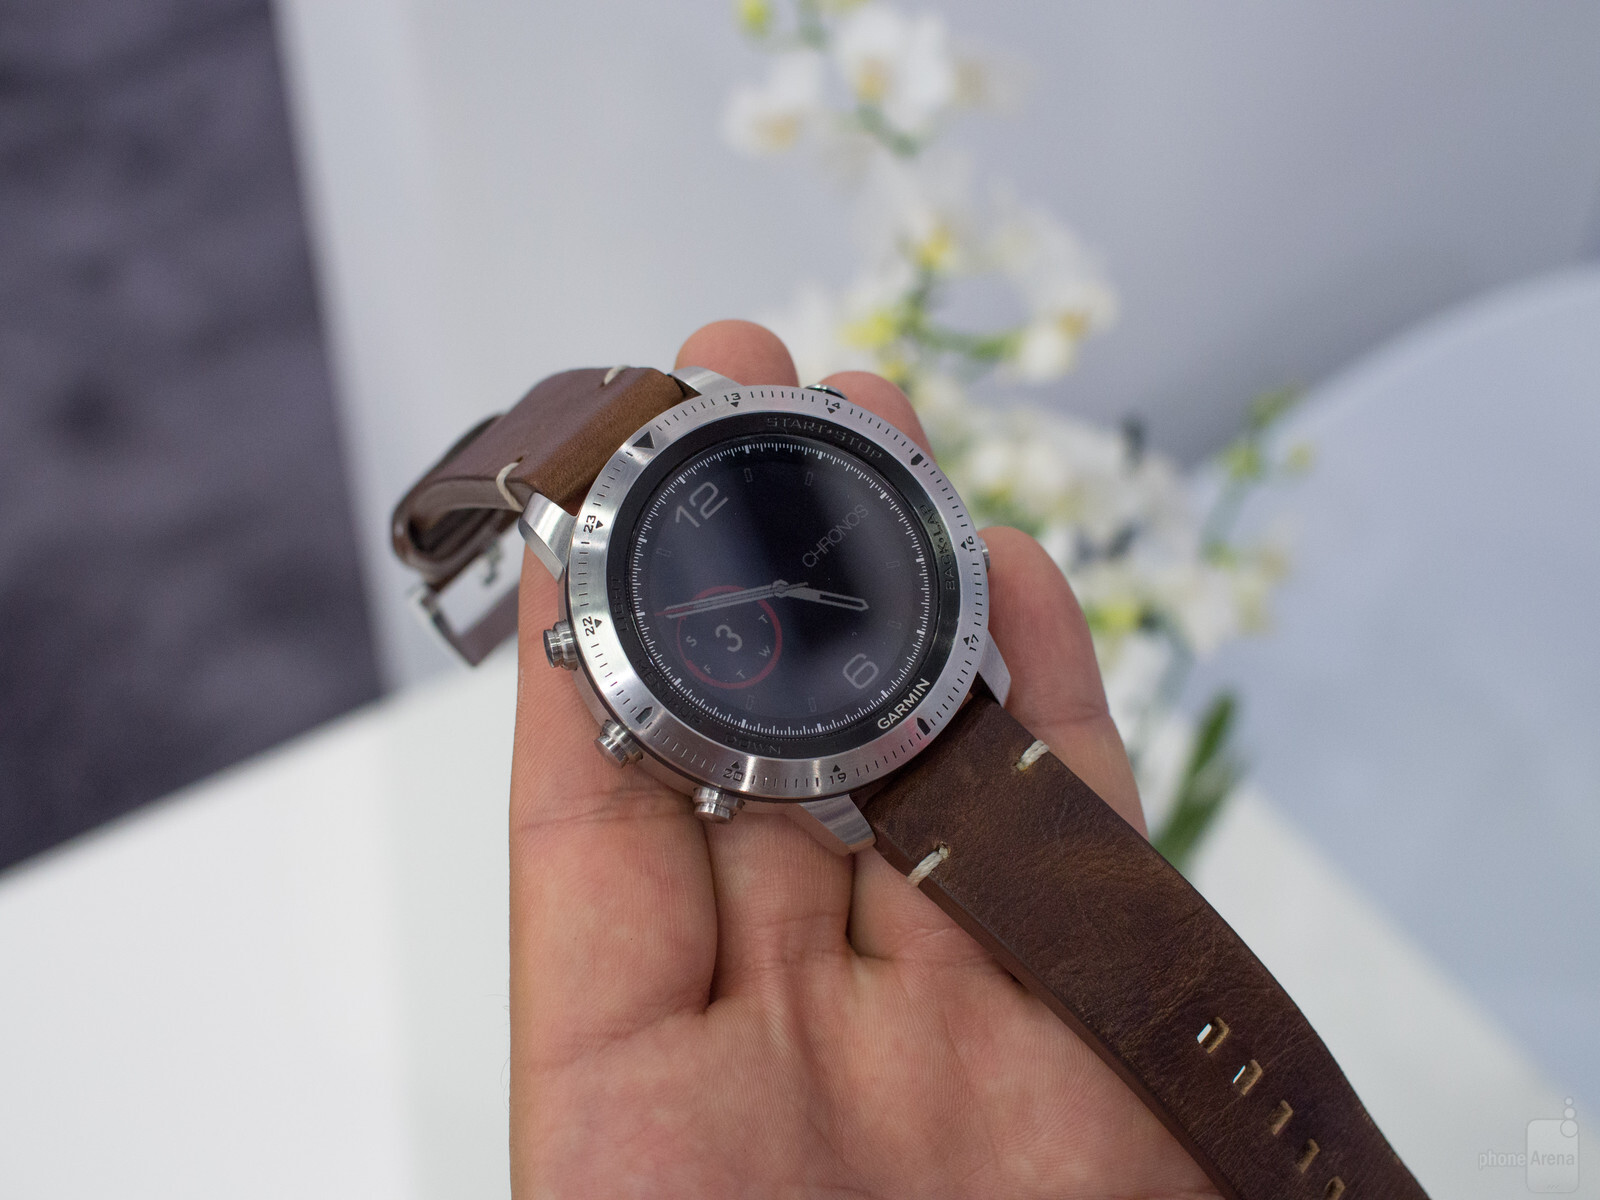 Fin Garmin Fenix Chronos hands-on: here's what a $1000 smartwatch CL-62